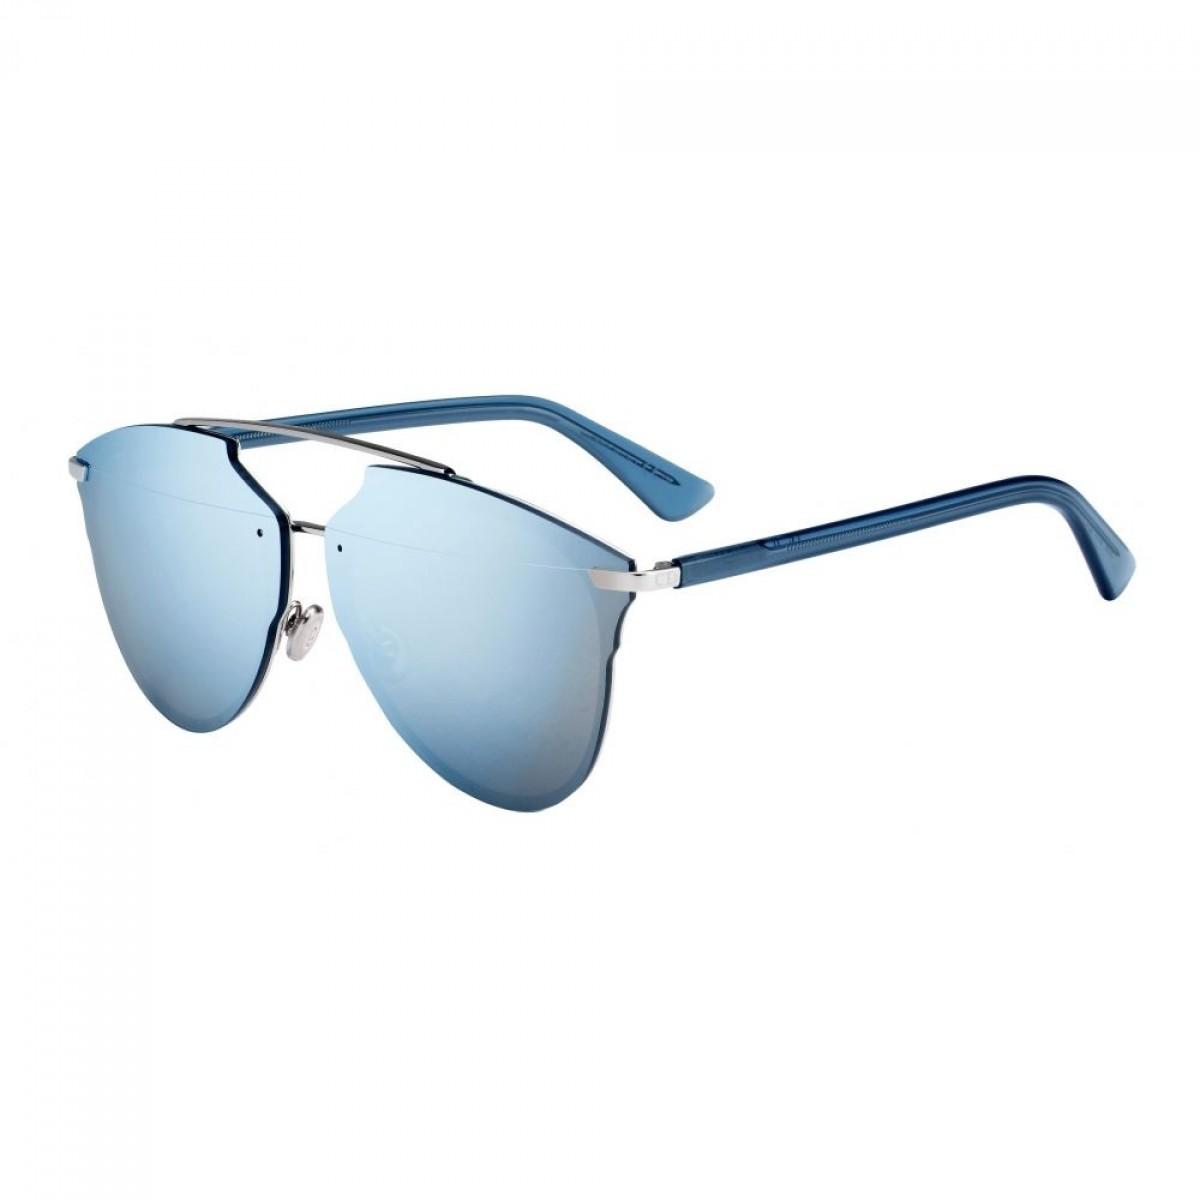 DIORREFLECTEDP S62, 390,00€, Occhiali Dior Blu a forma Rotondo